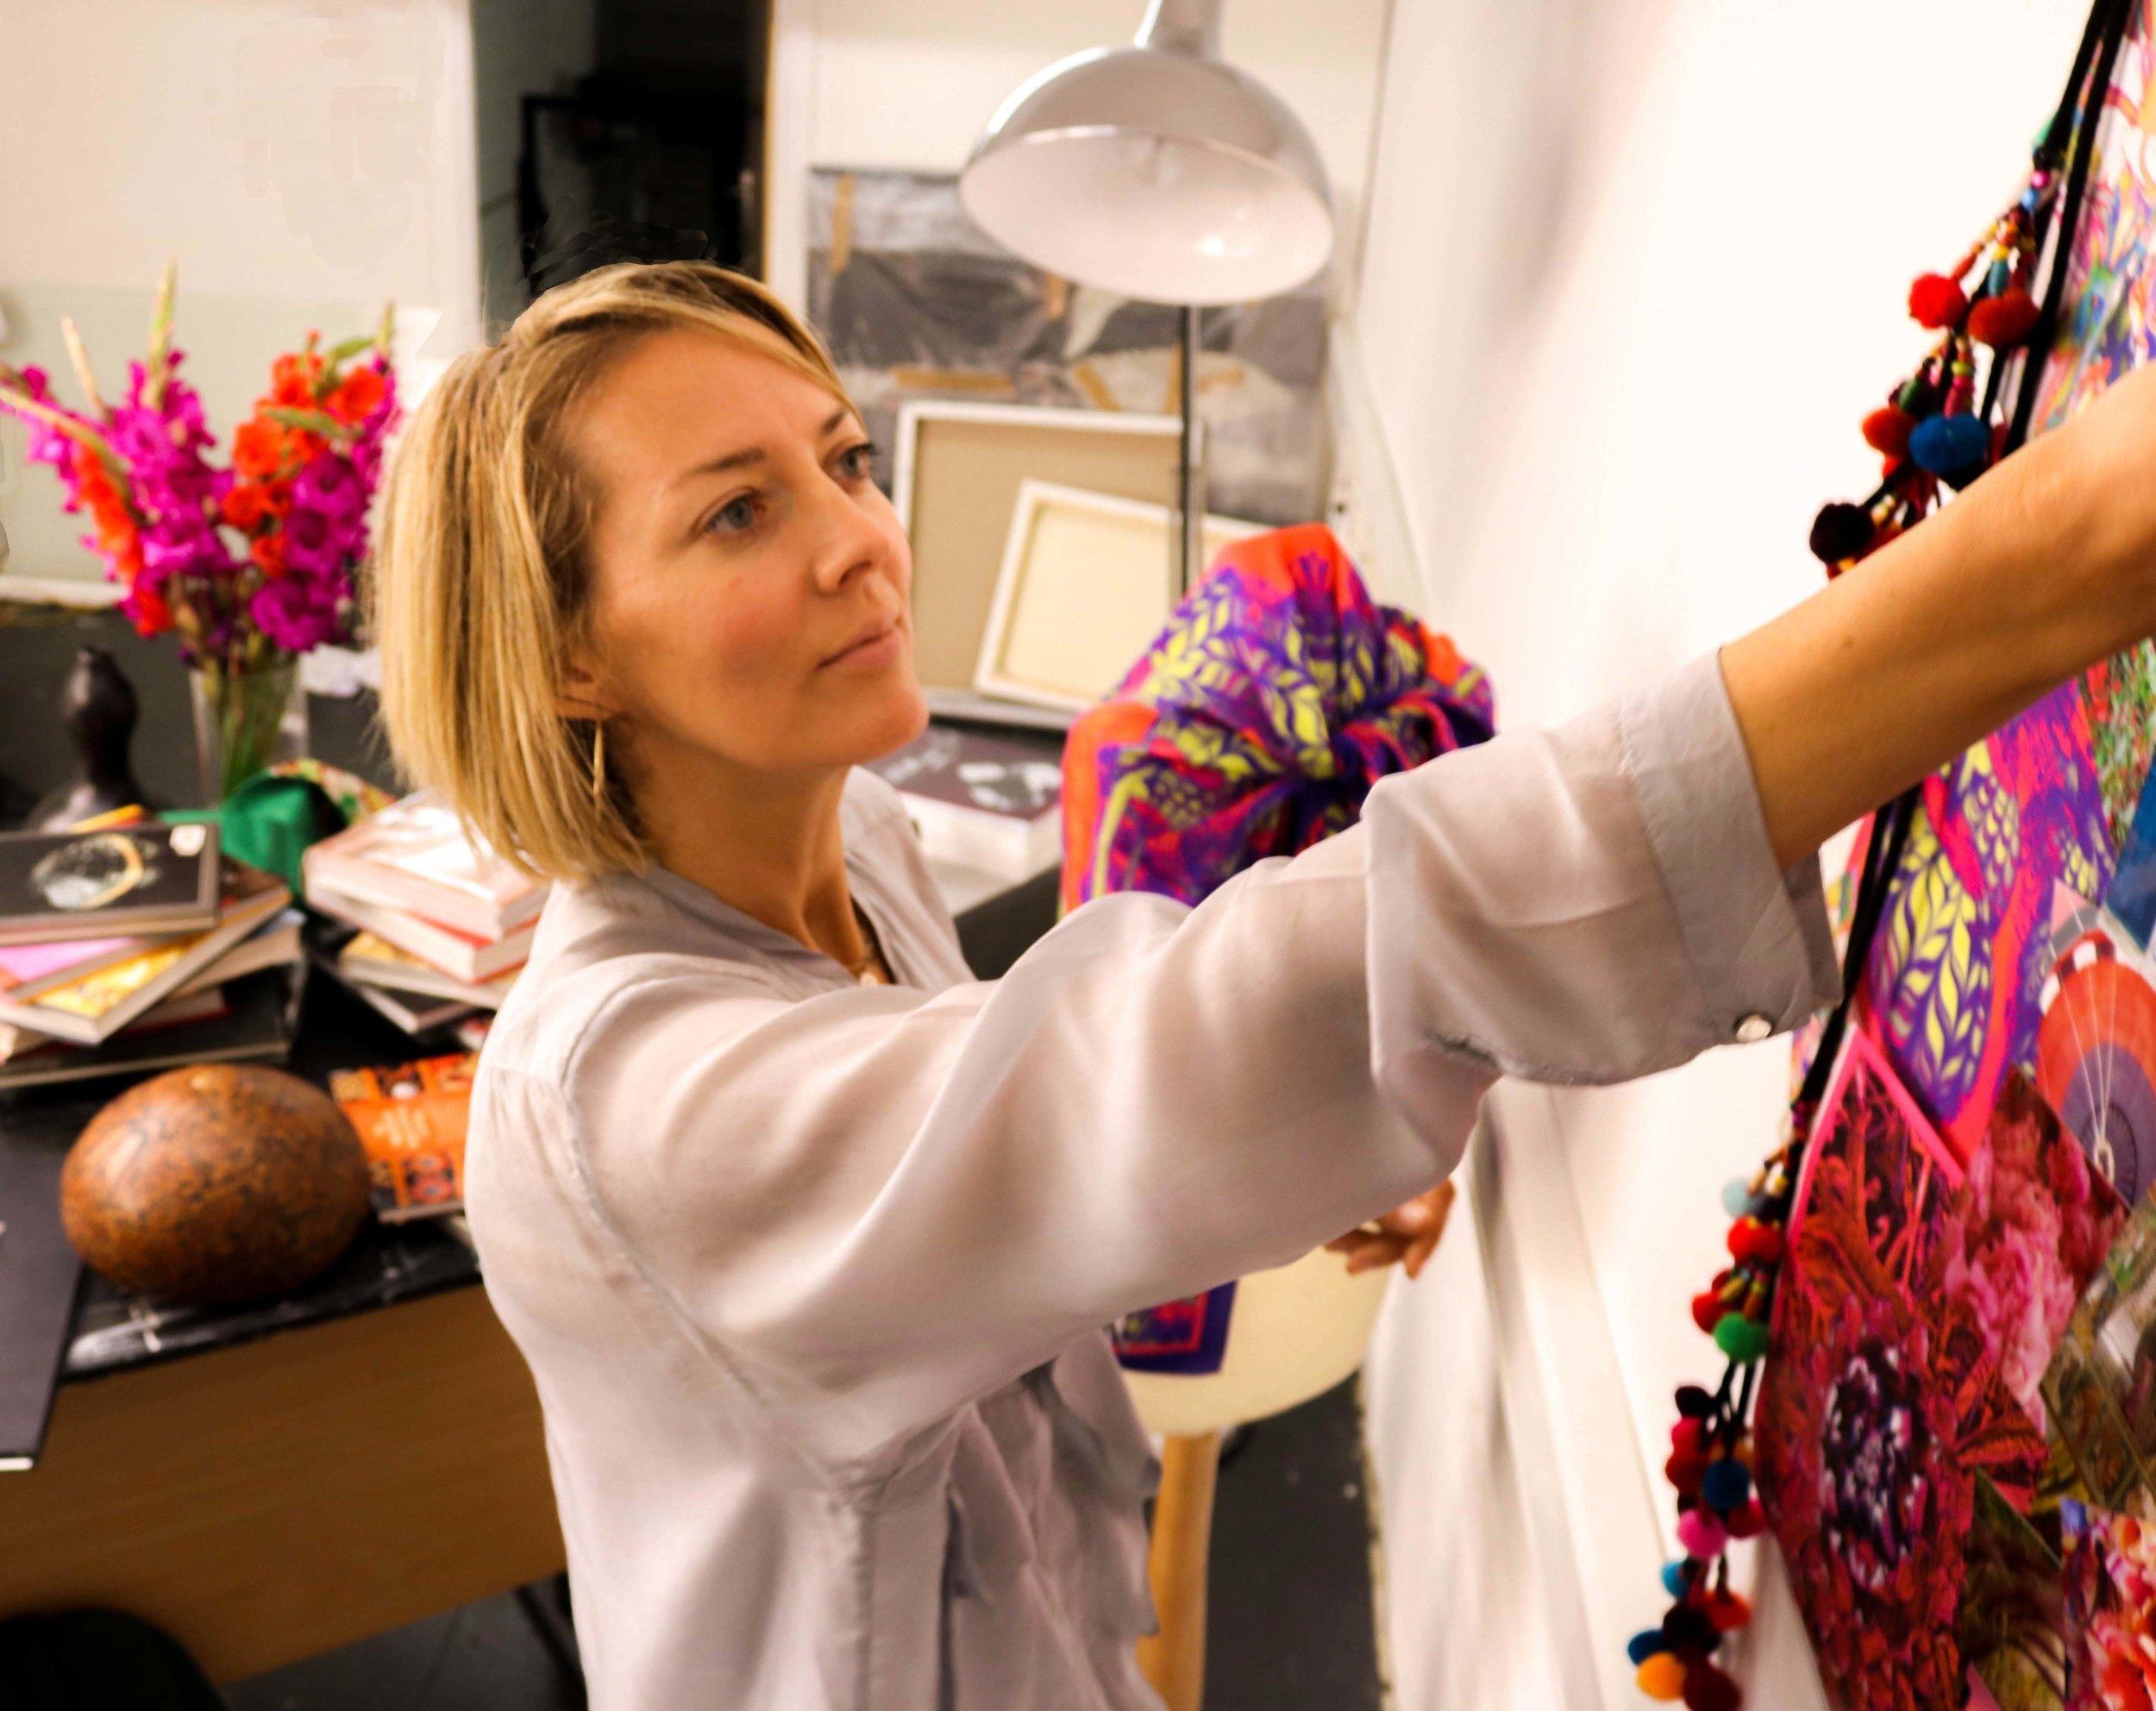 Debbie Millington - Irish fashion designer luxury brand silk scarves and accessories .jpg